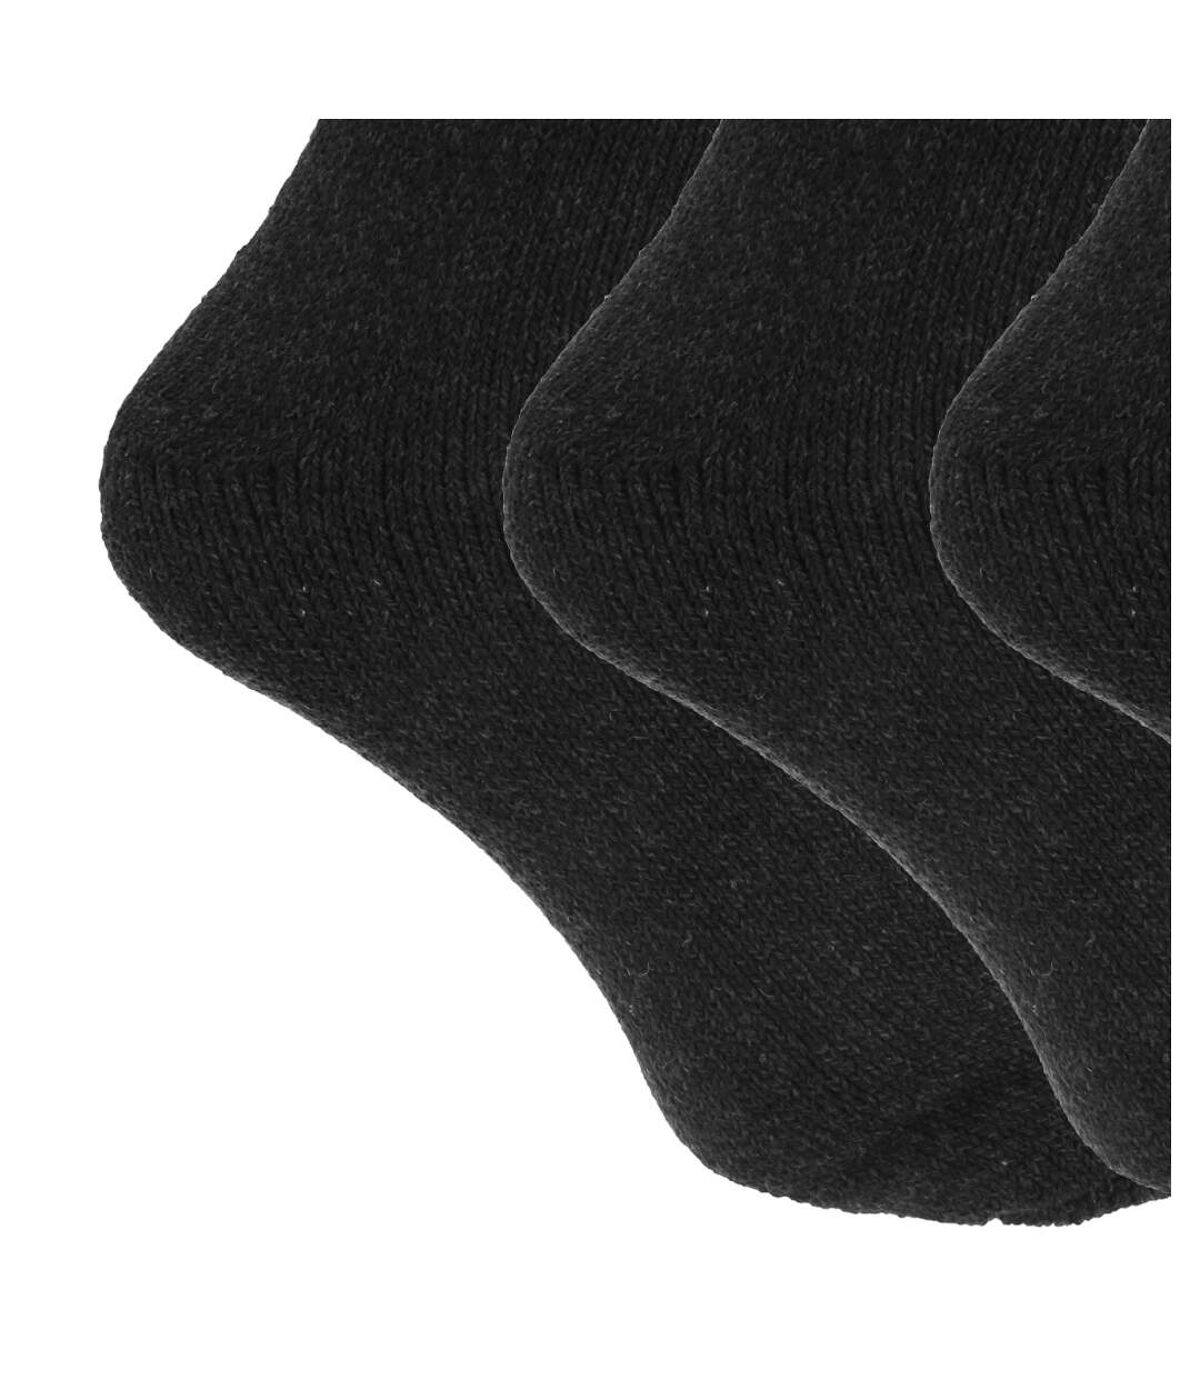 Mens Wool Blend Fully Cushioned Thermal Boot Socks (Pack Of 3) (Black) - UTMB430